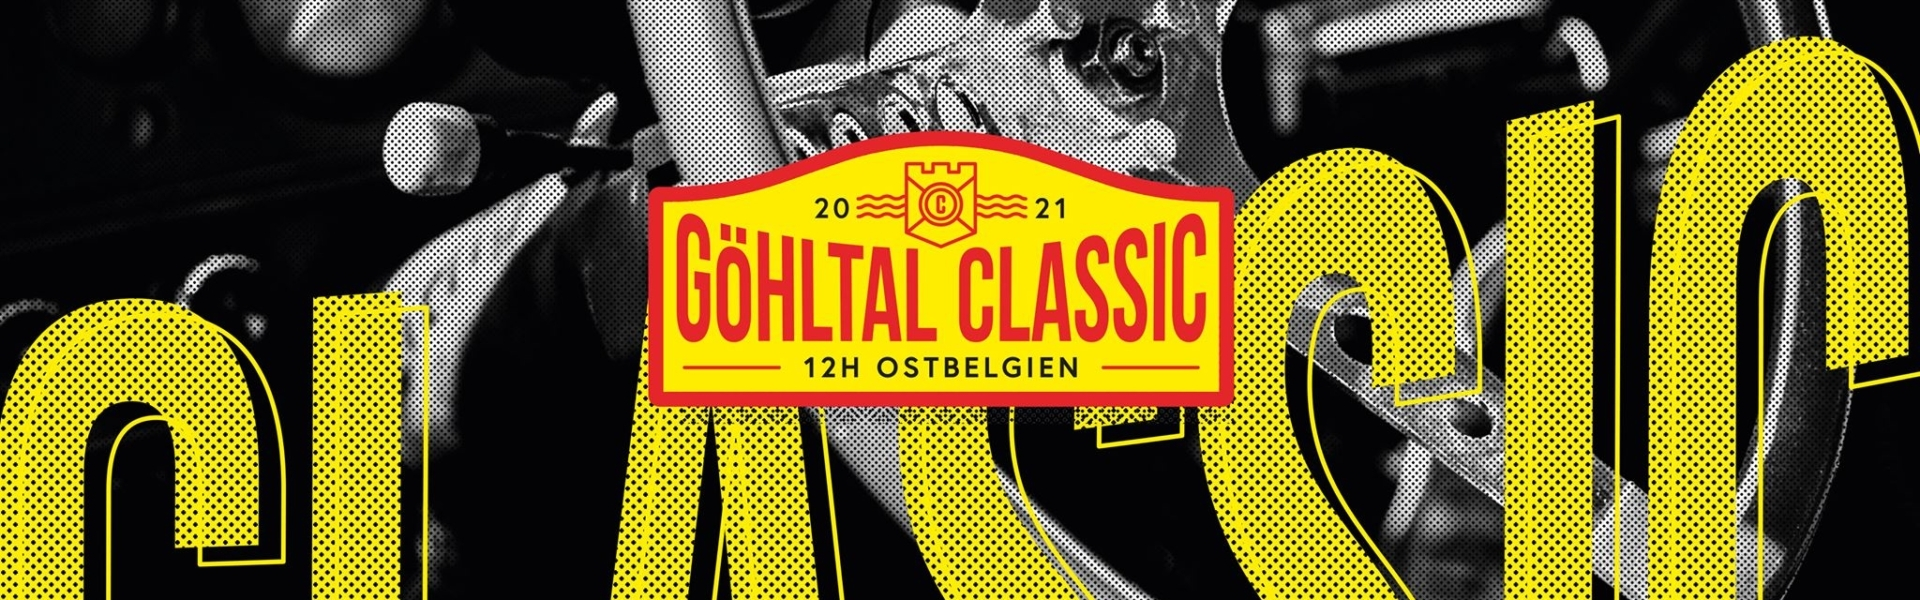 Göhltal Classic